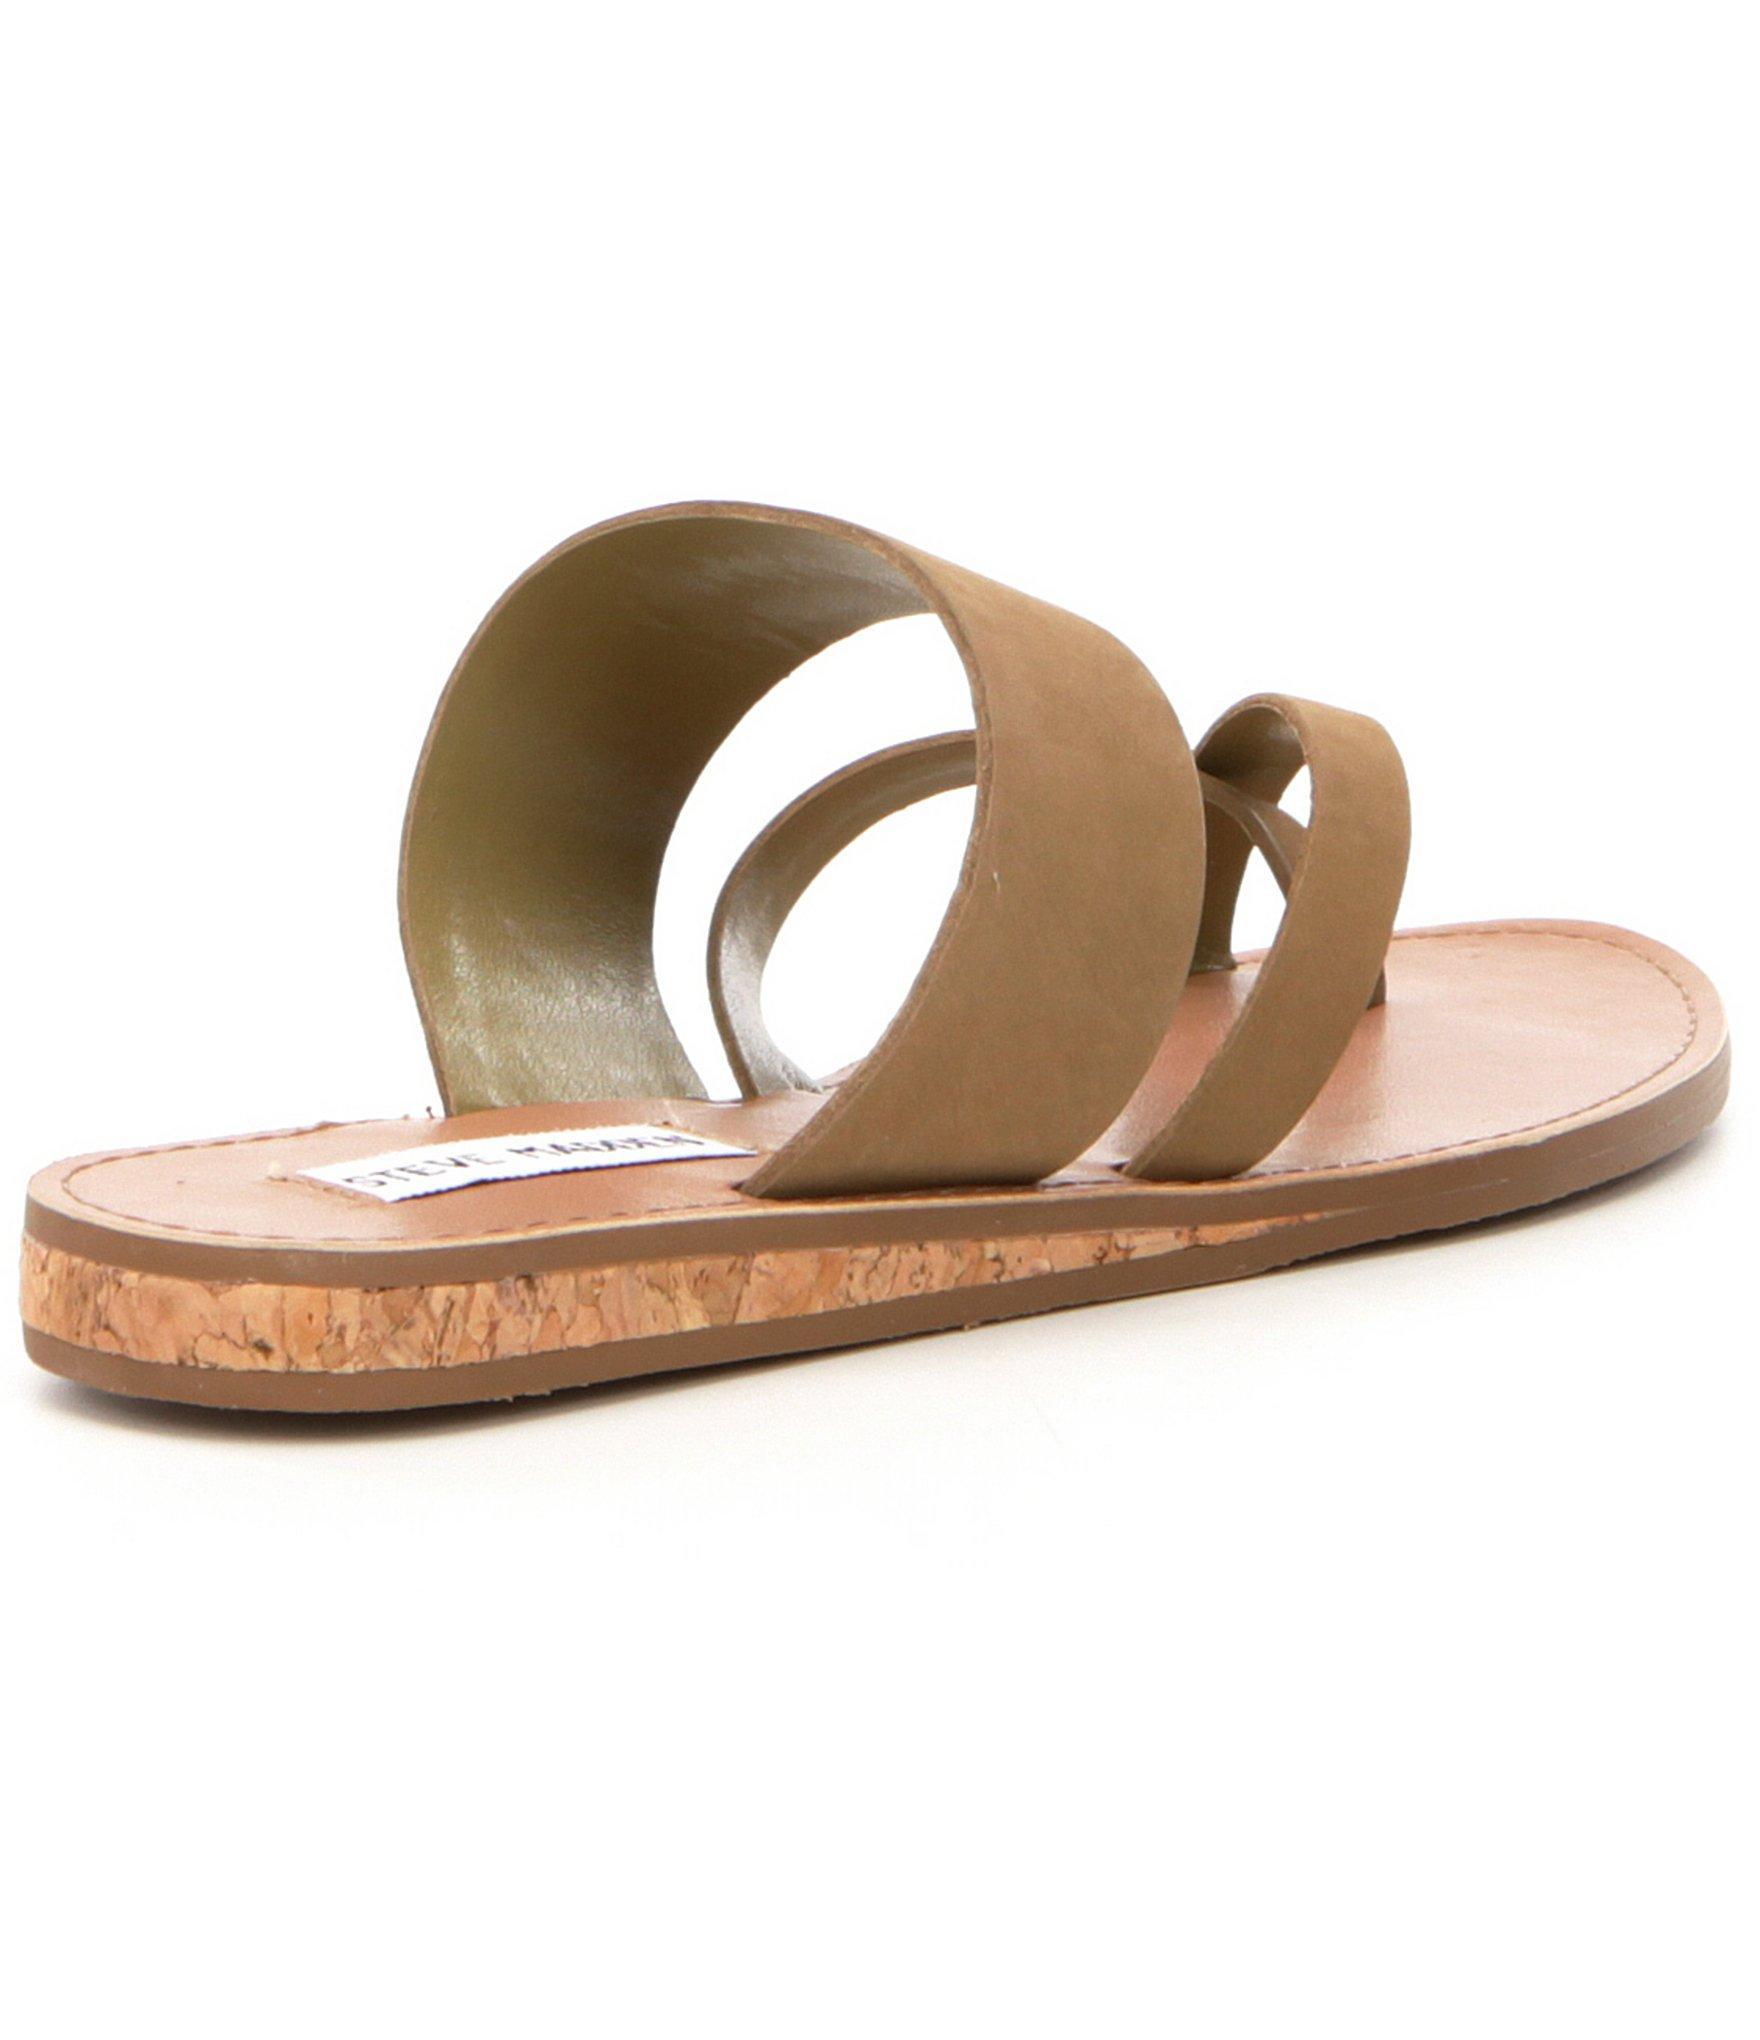 b00d94ebadbc Lyst - Steve Madden Henly Banded Nubuck Sandals